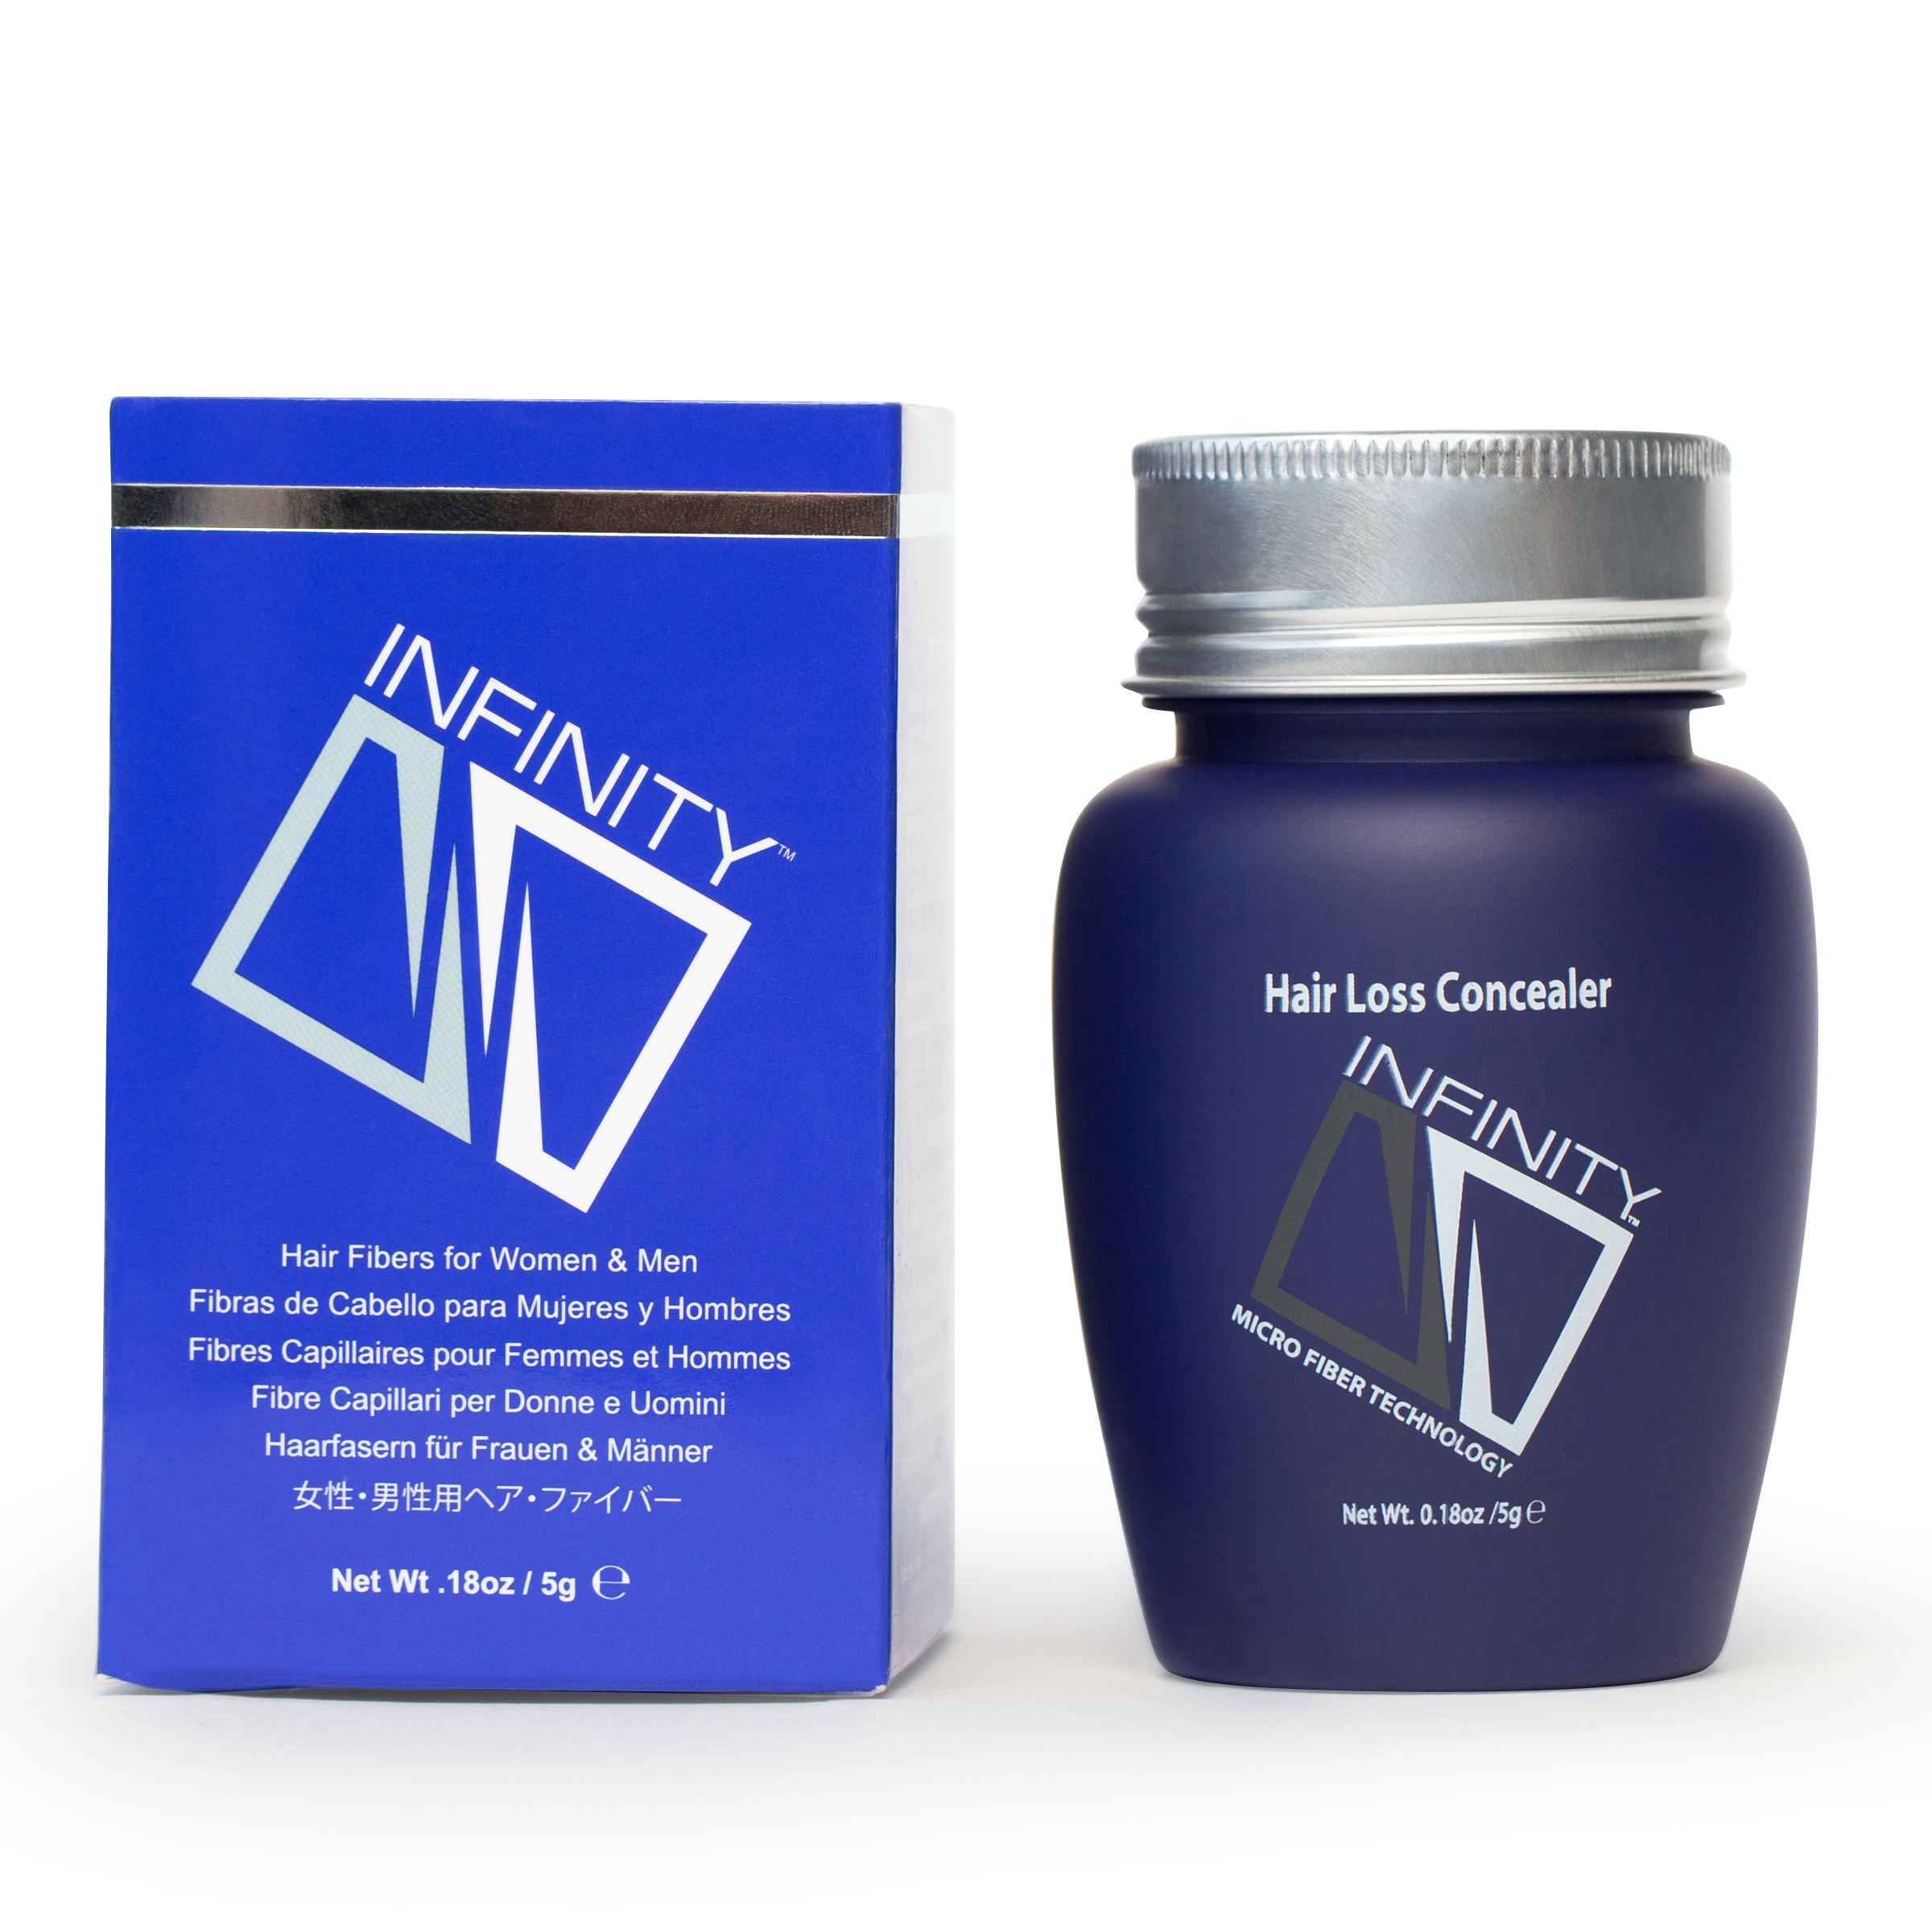 Infinity Hair Fibers For Women & Men - 5g TRIAL SIZE